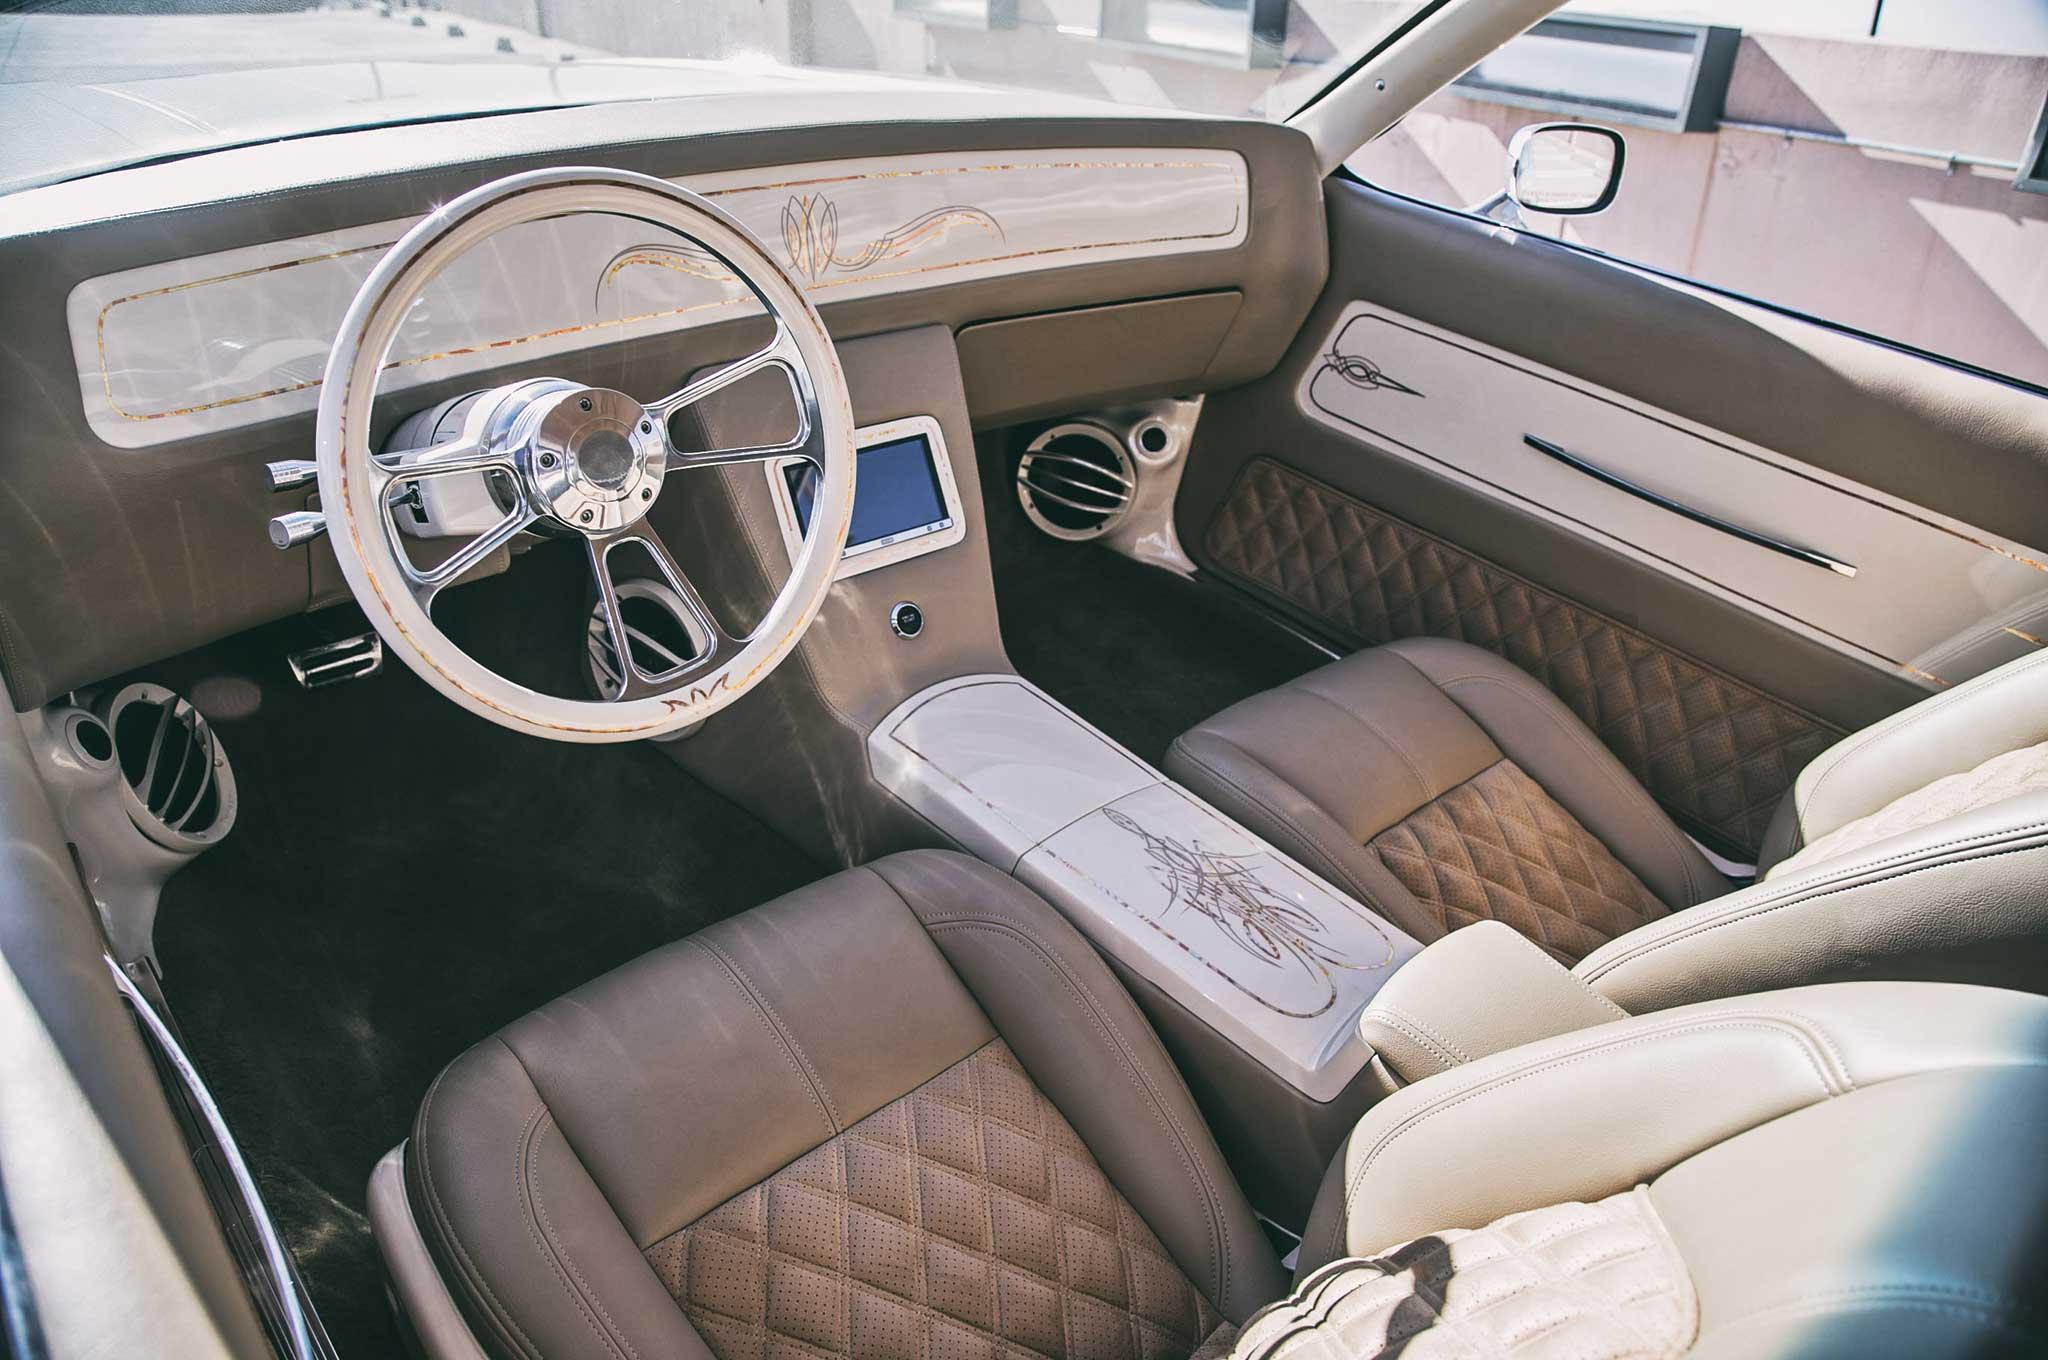 1985 Oldsmobile Cutlass Supreme Hurting Feelings Lowrider